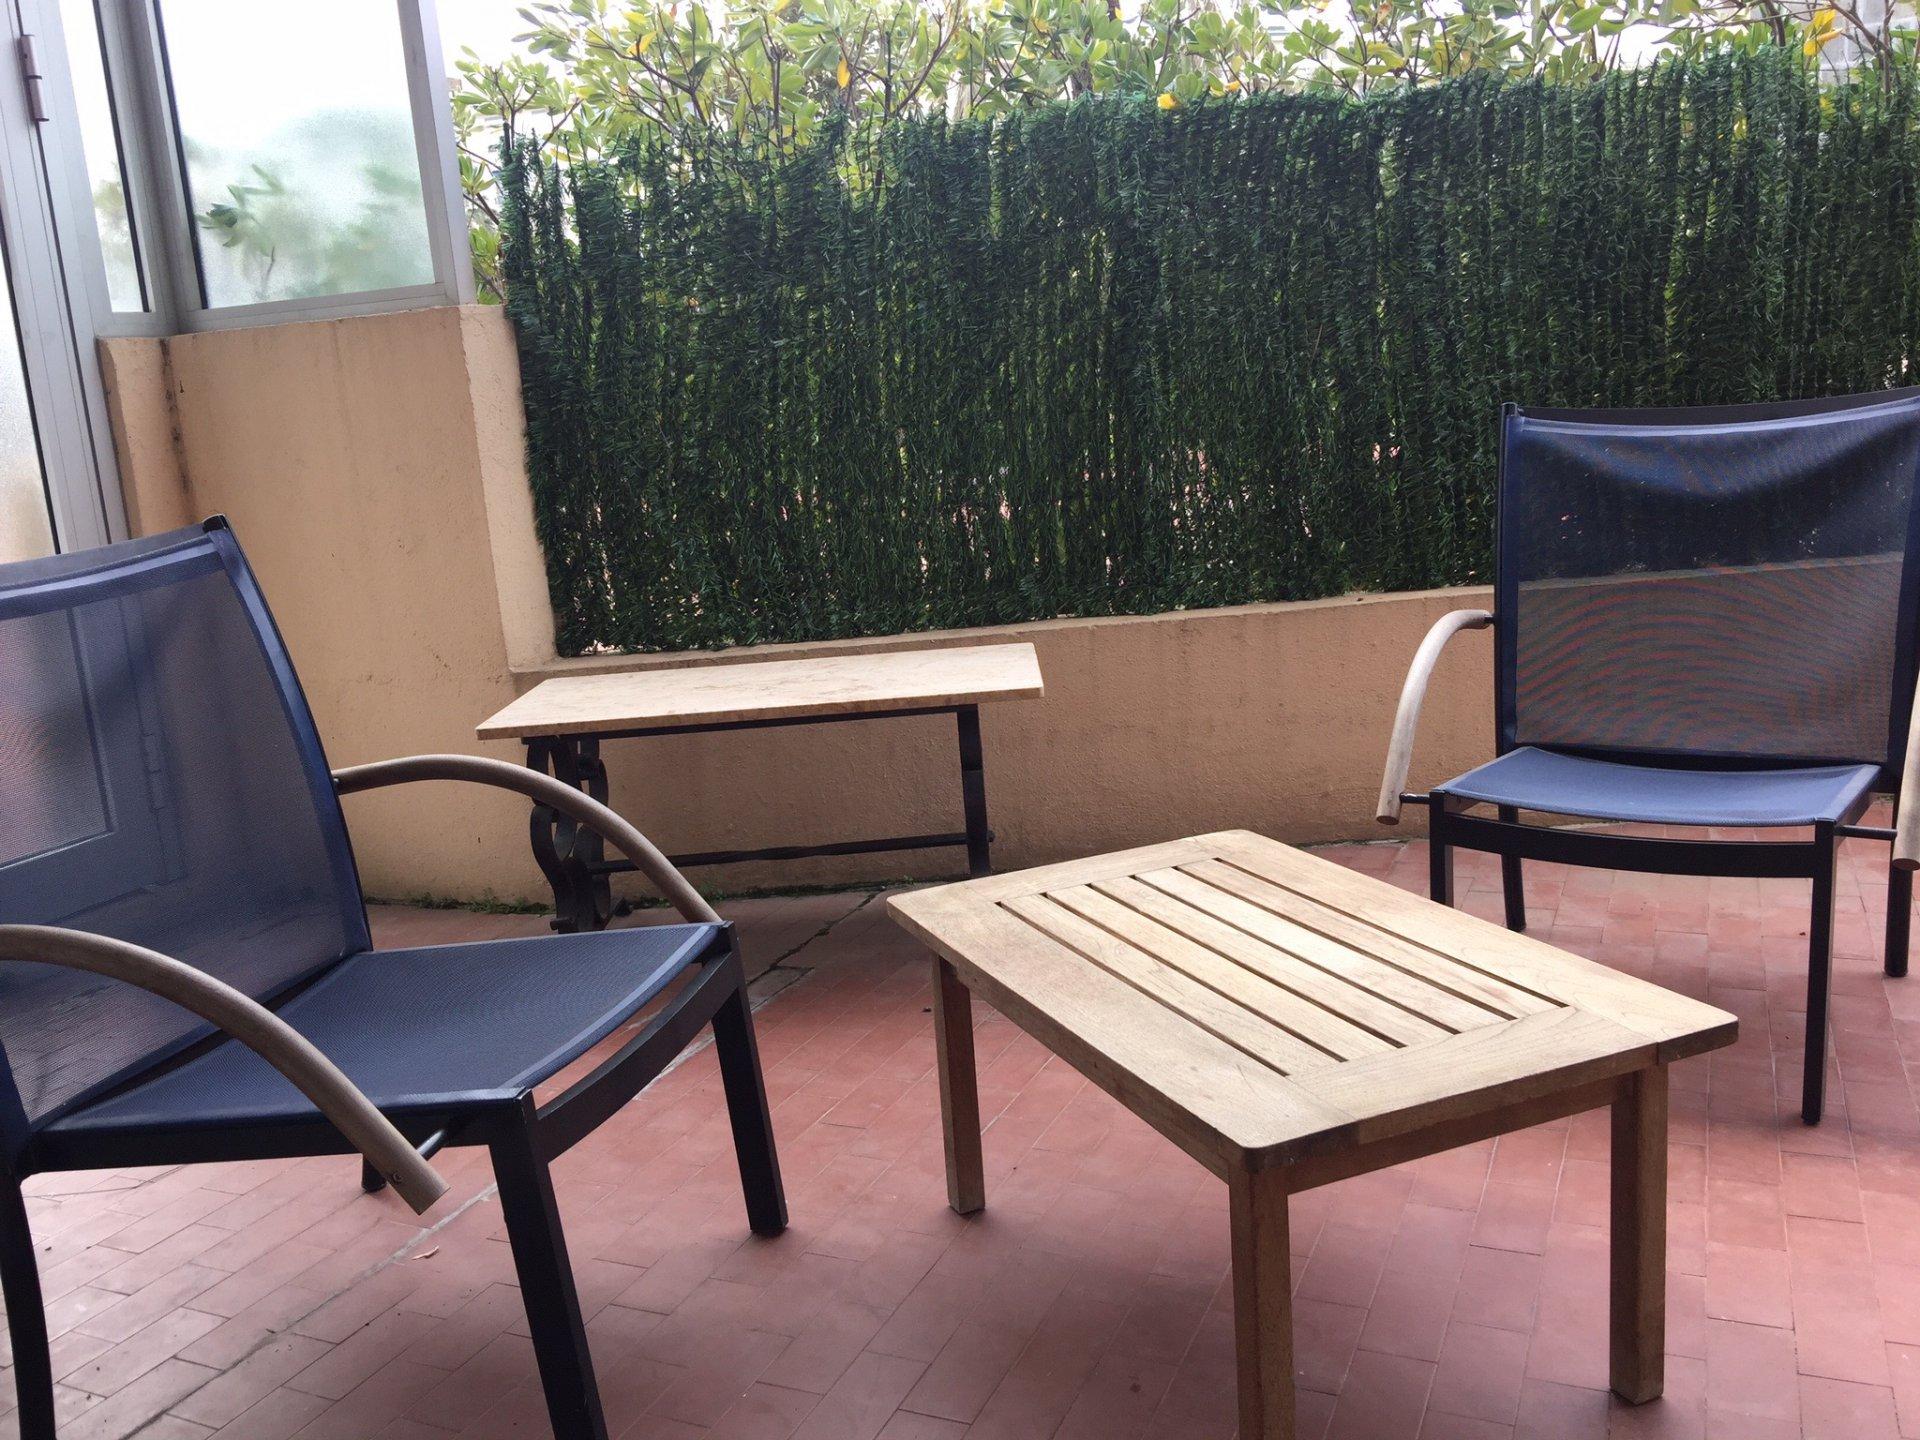 Affitto stagionale Appartamento - Cannes Basse Californie